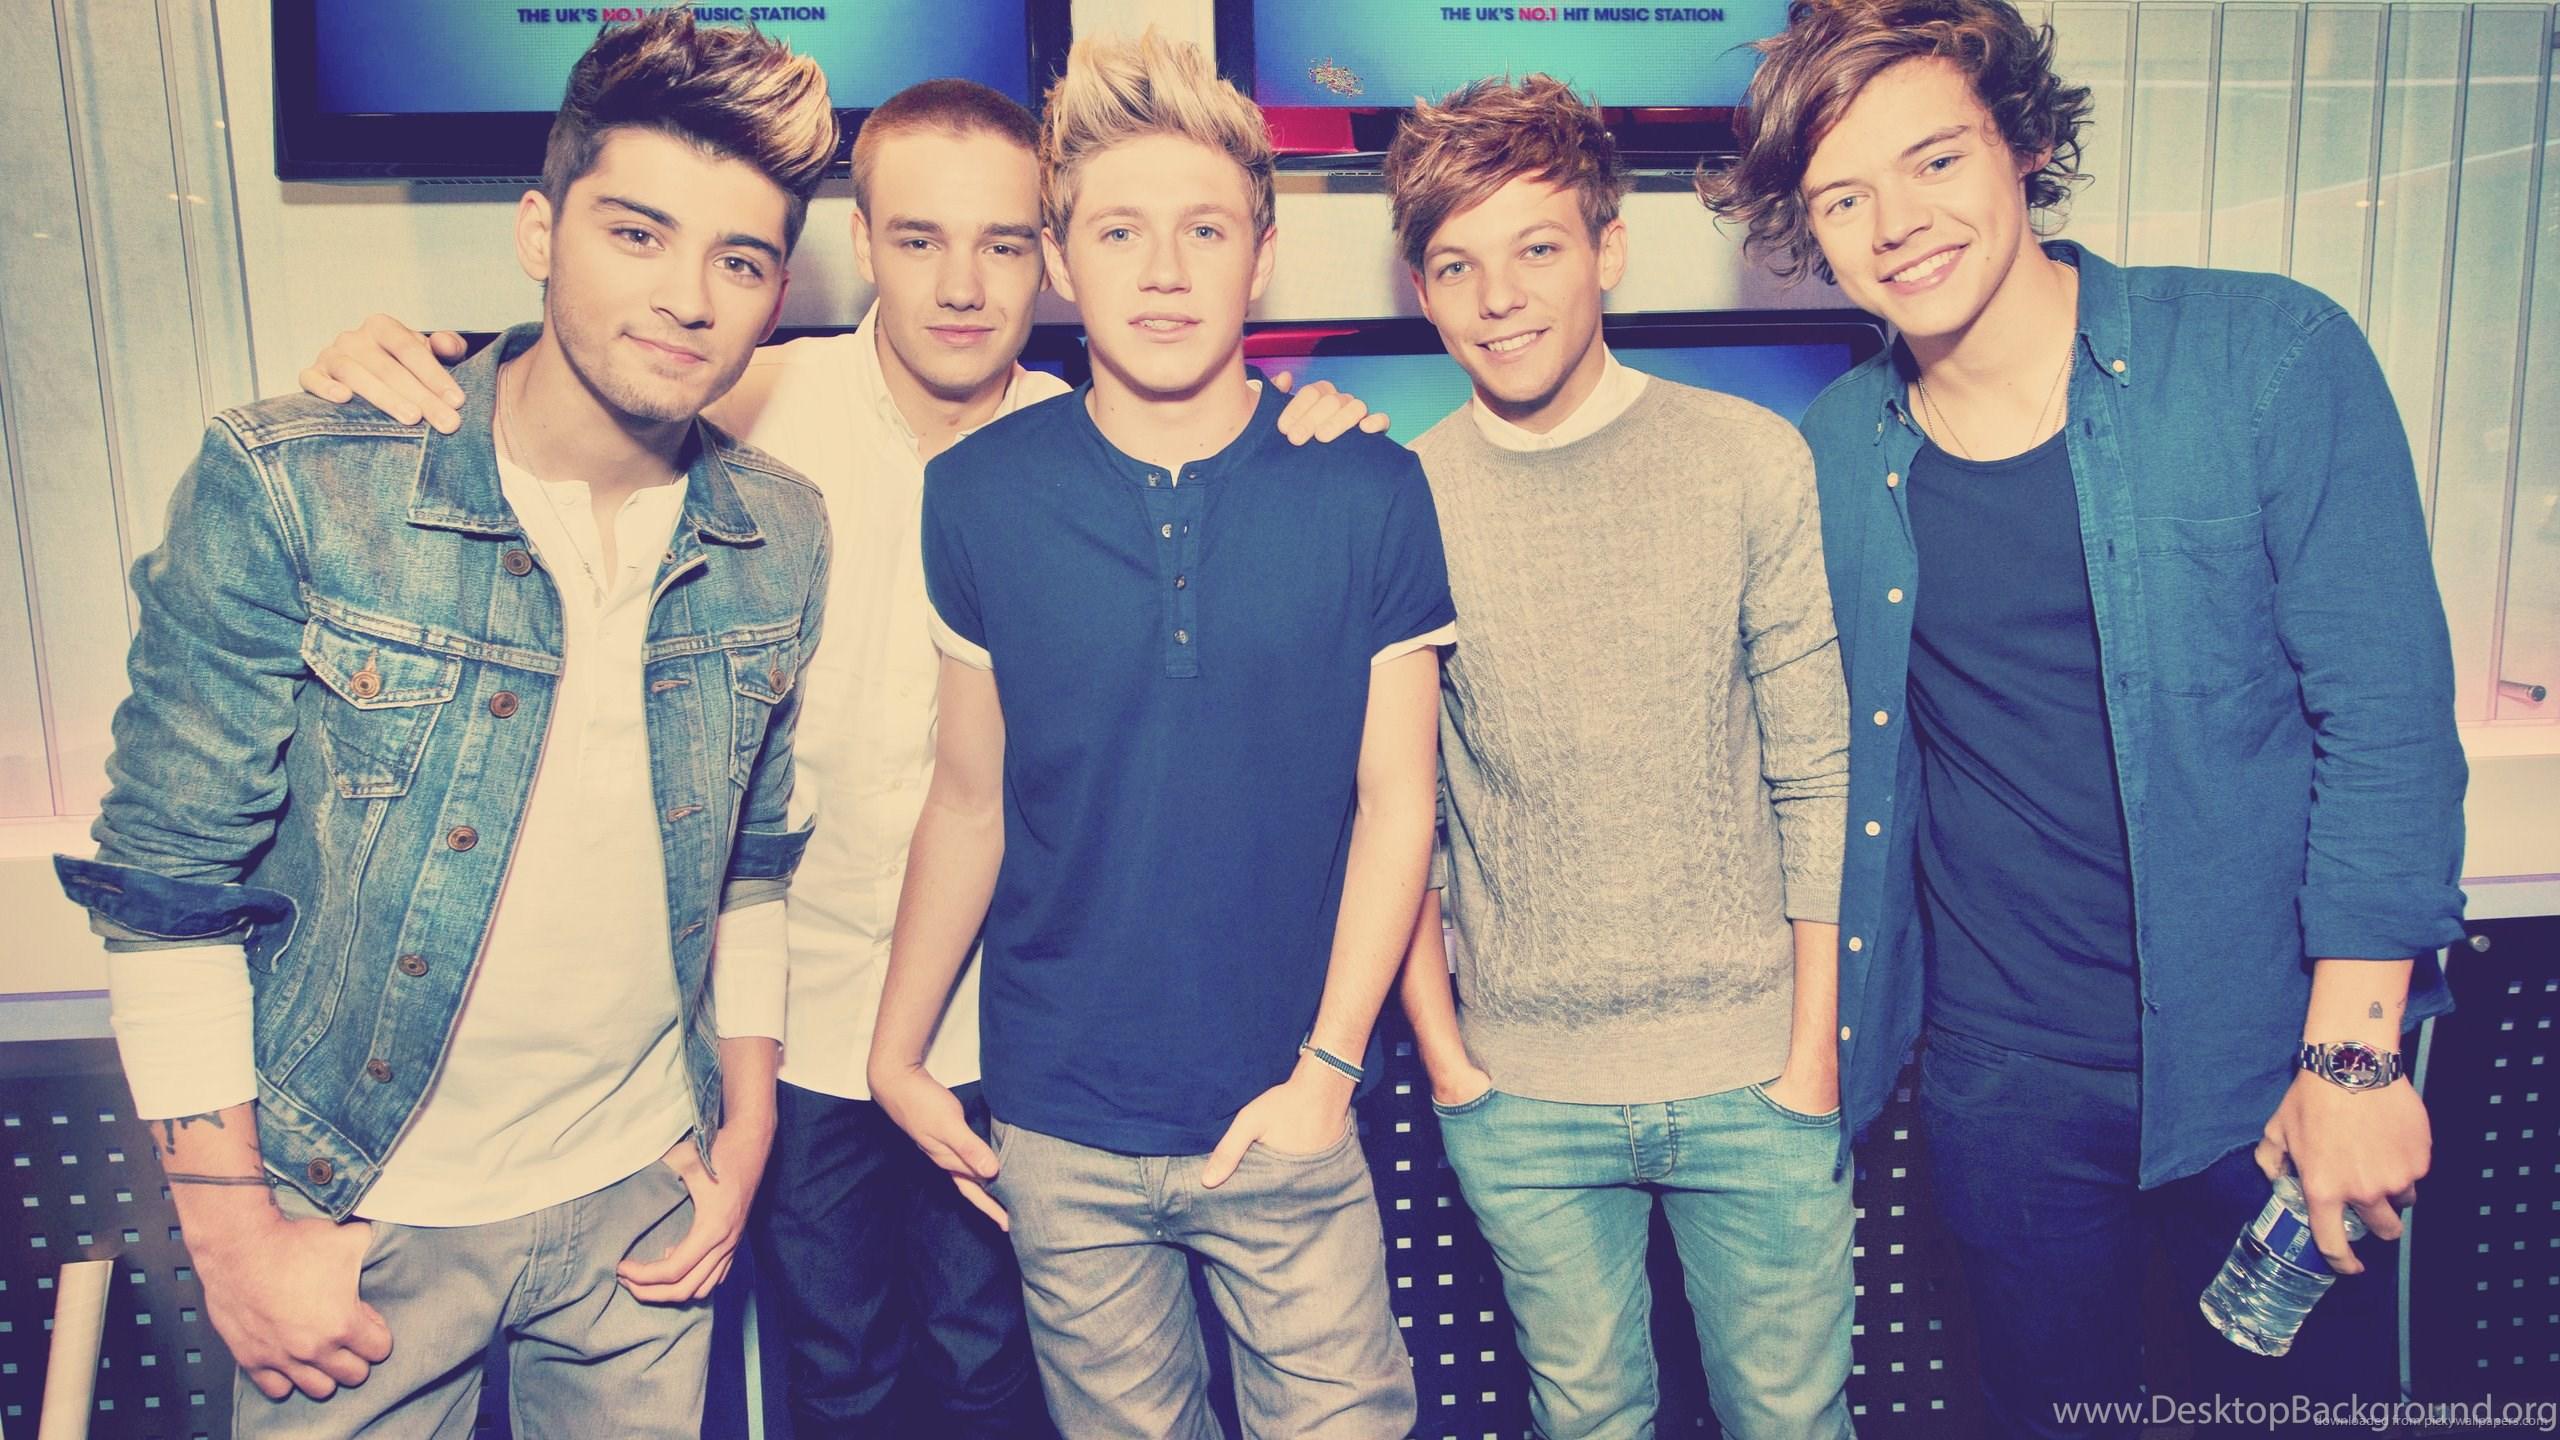 One Direction Backgrounds 2015 Wallpaper Backgrounds Kemecer Com